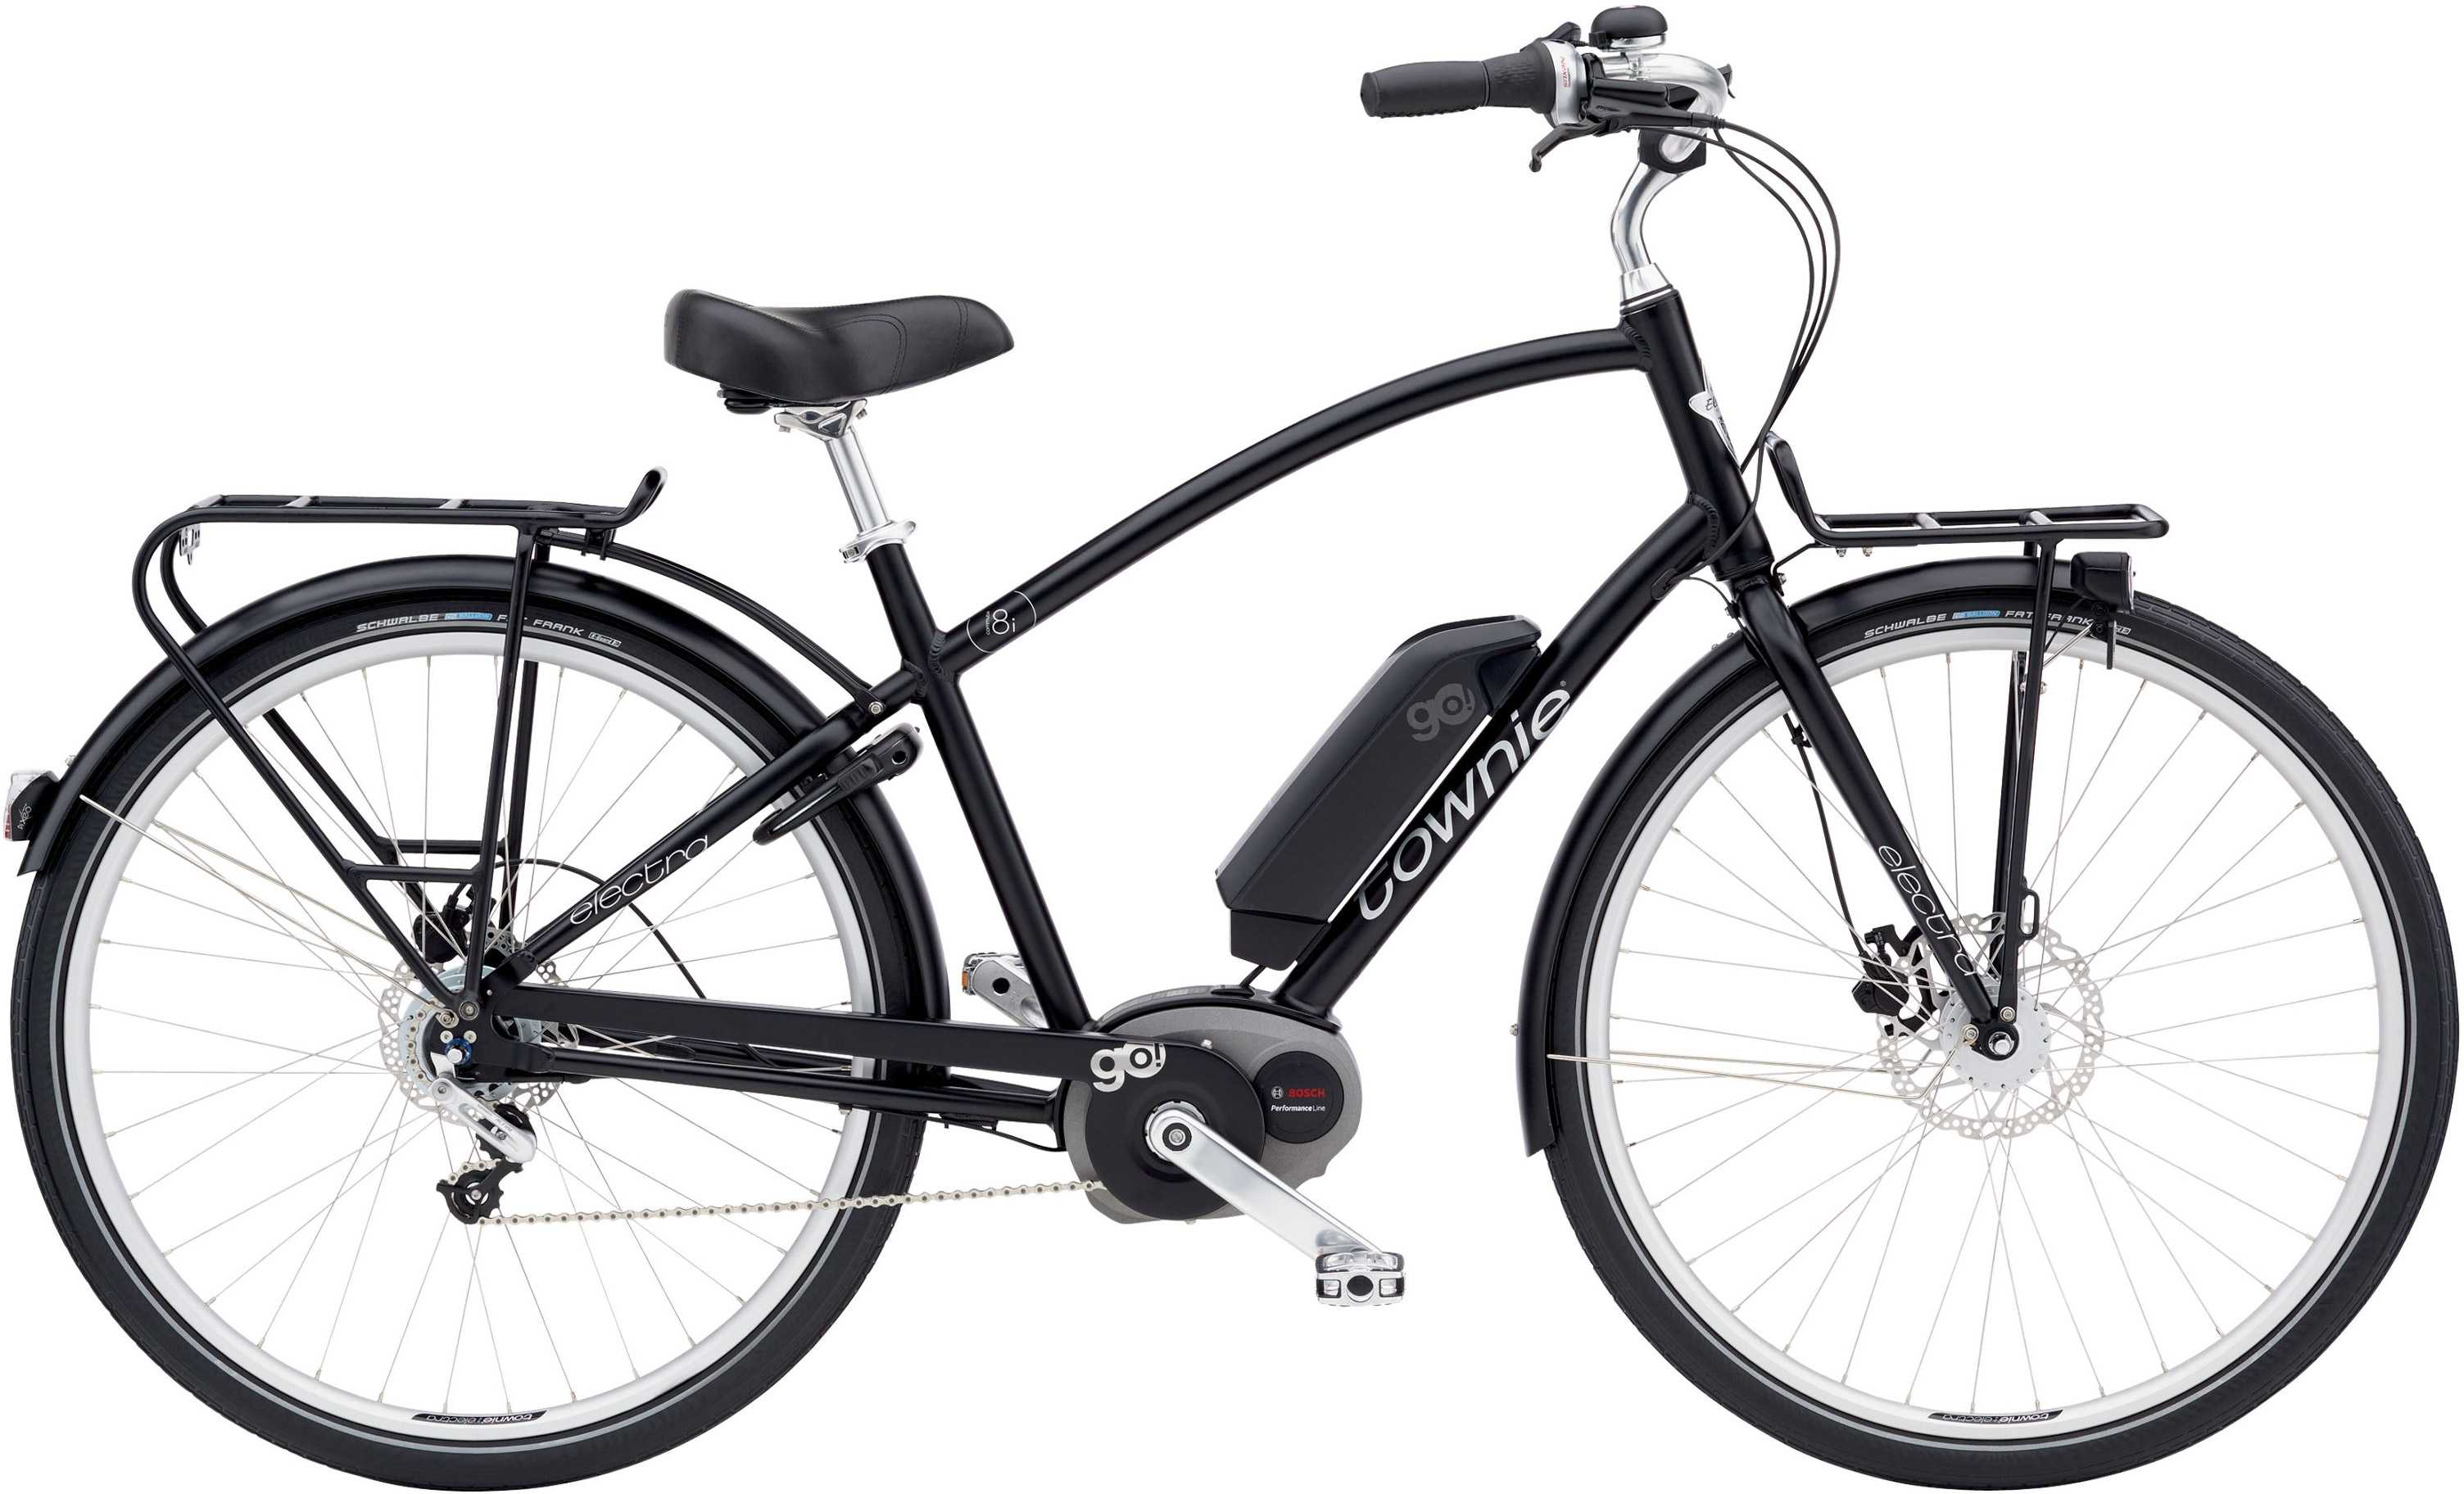 Electra Townie Commute Go! 8I herr svart one-size